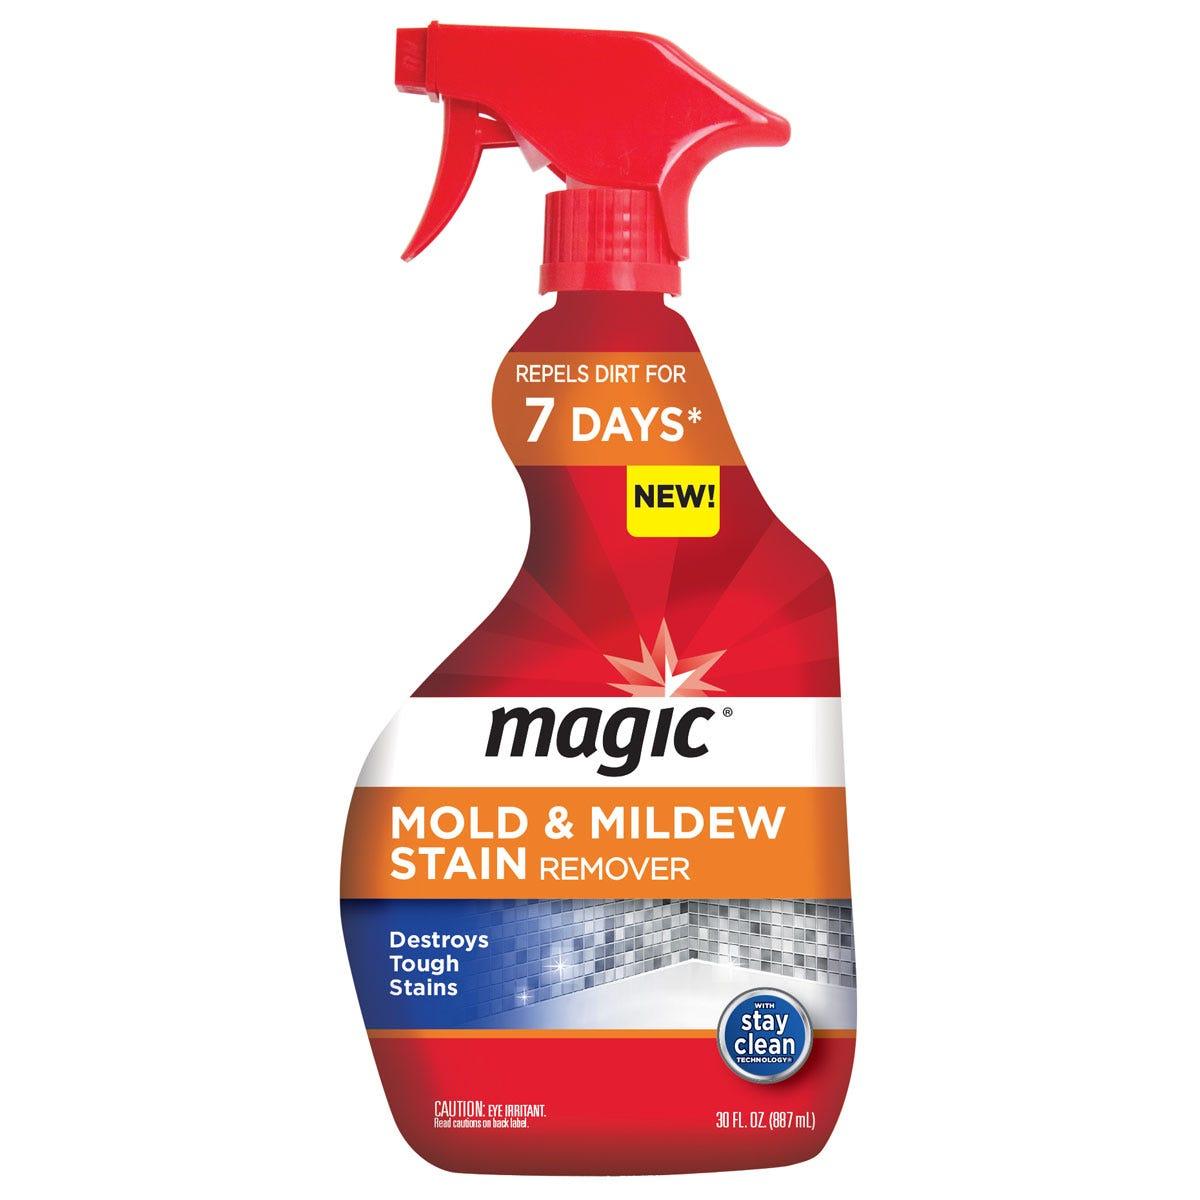 Mildew stain remover